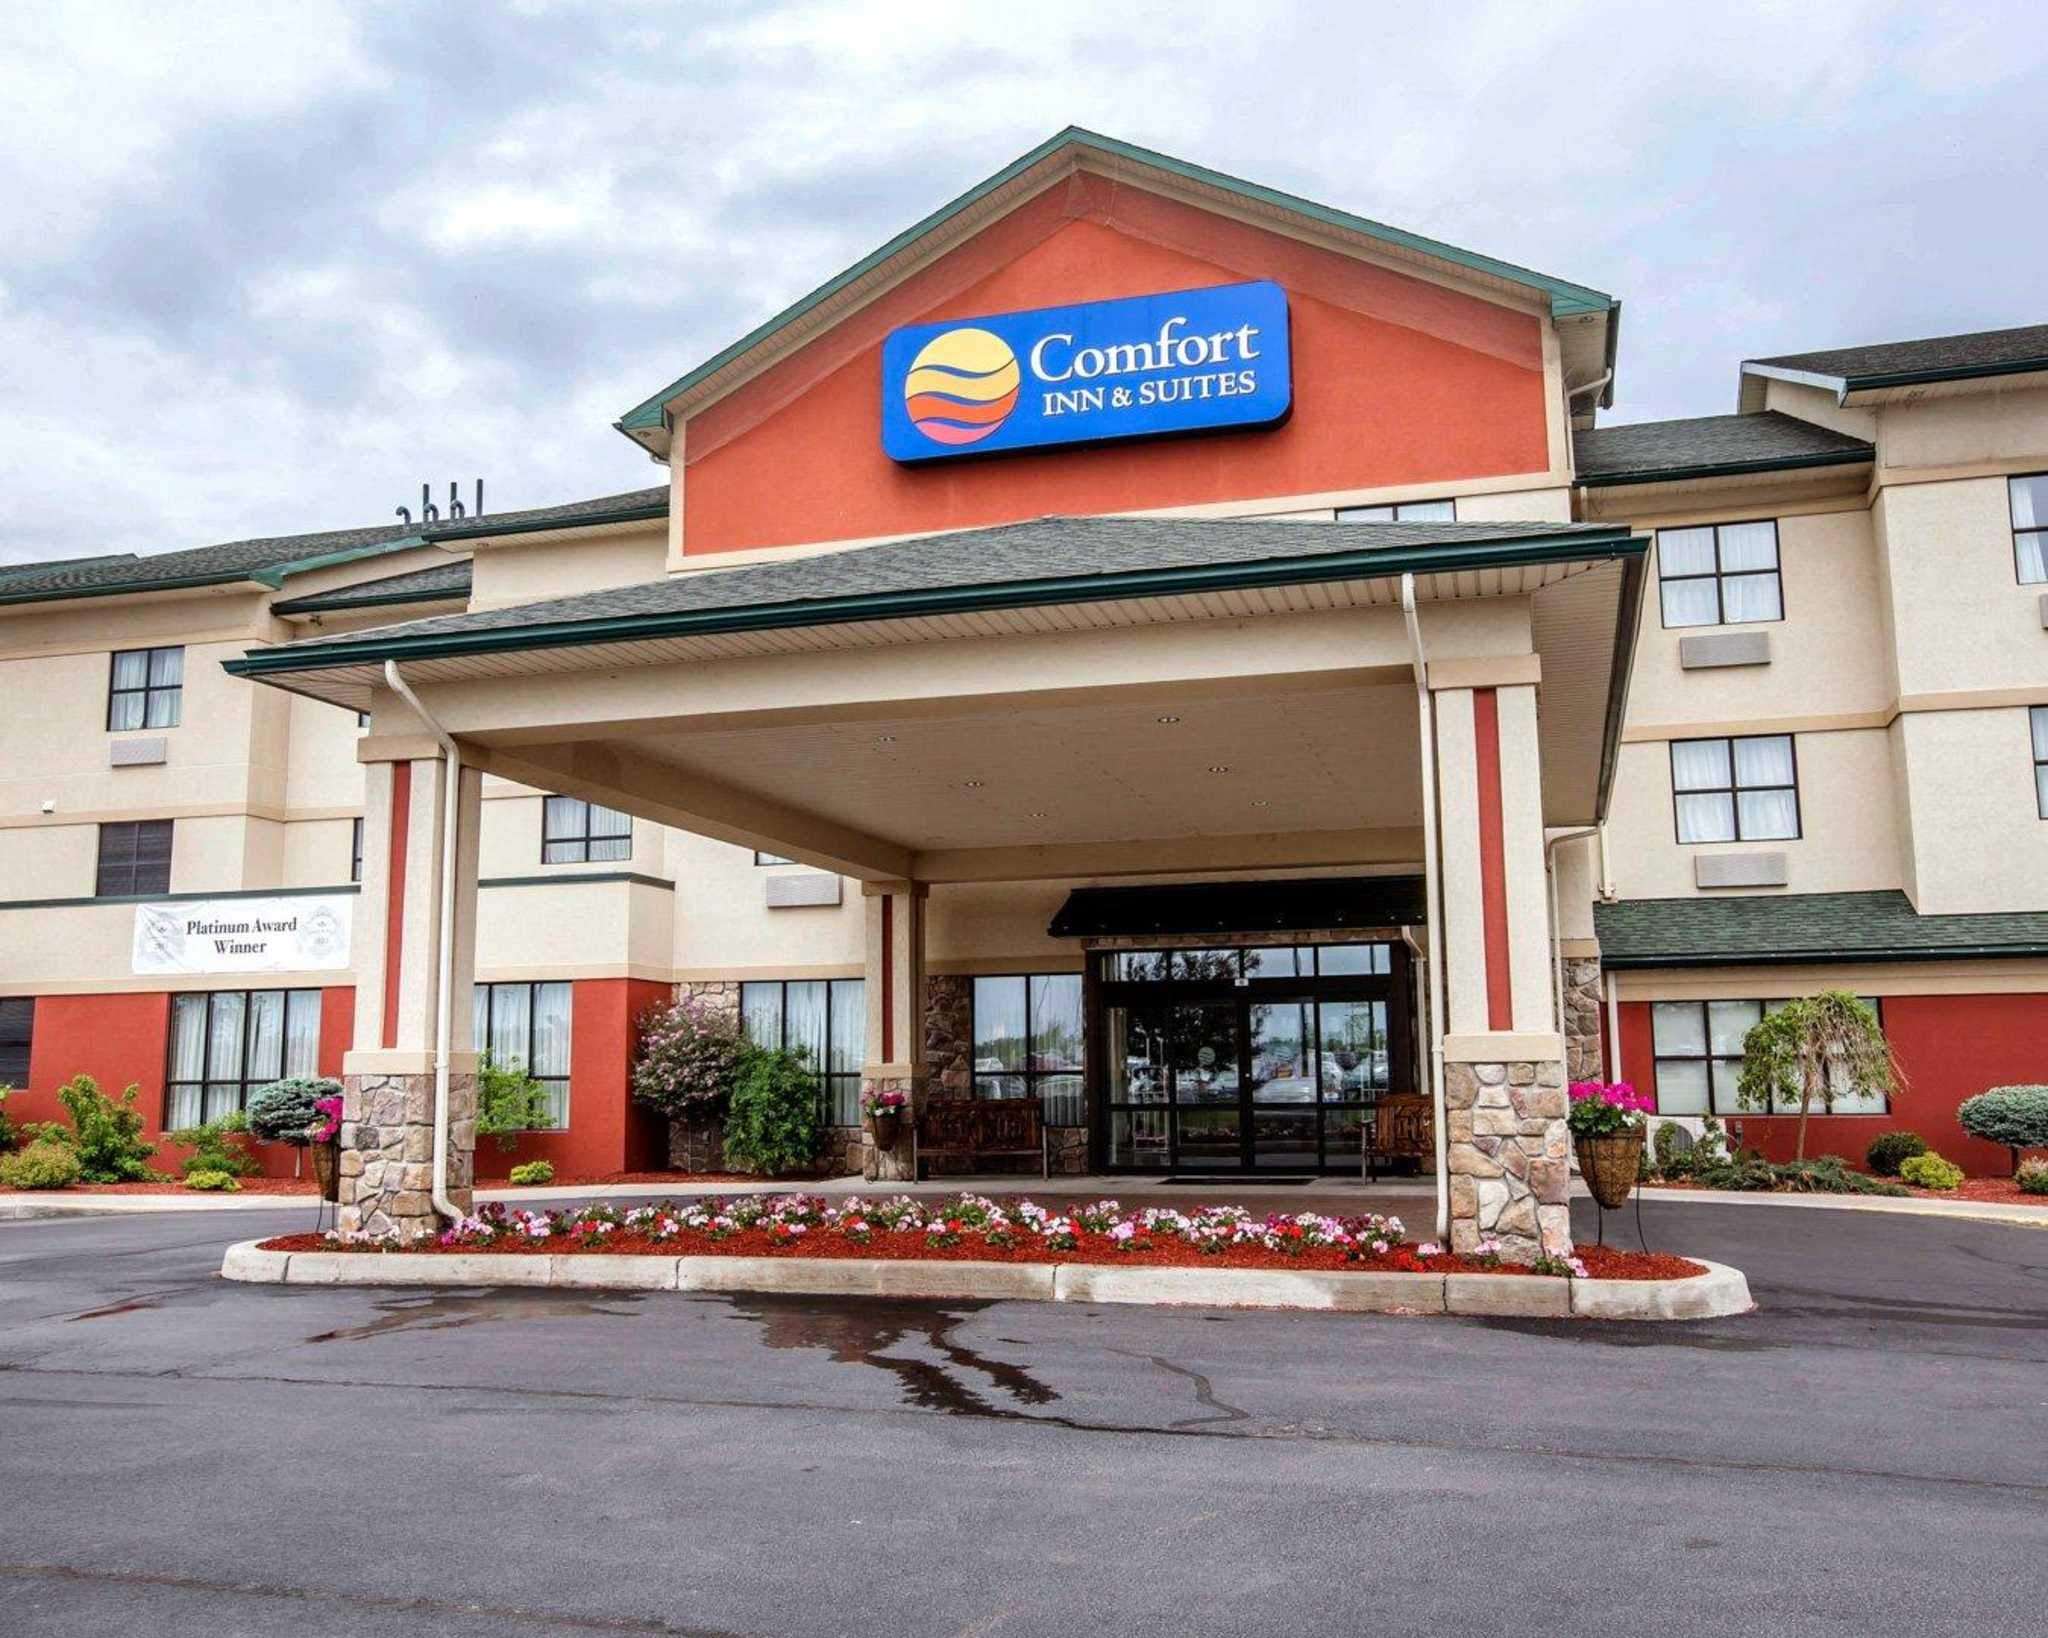 Comfort Inn & Suites adj to Akwesasne Mohawk Casino image 1